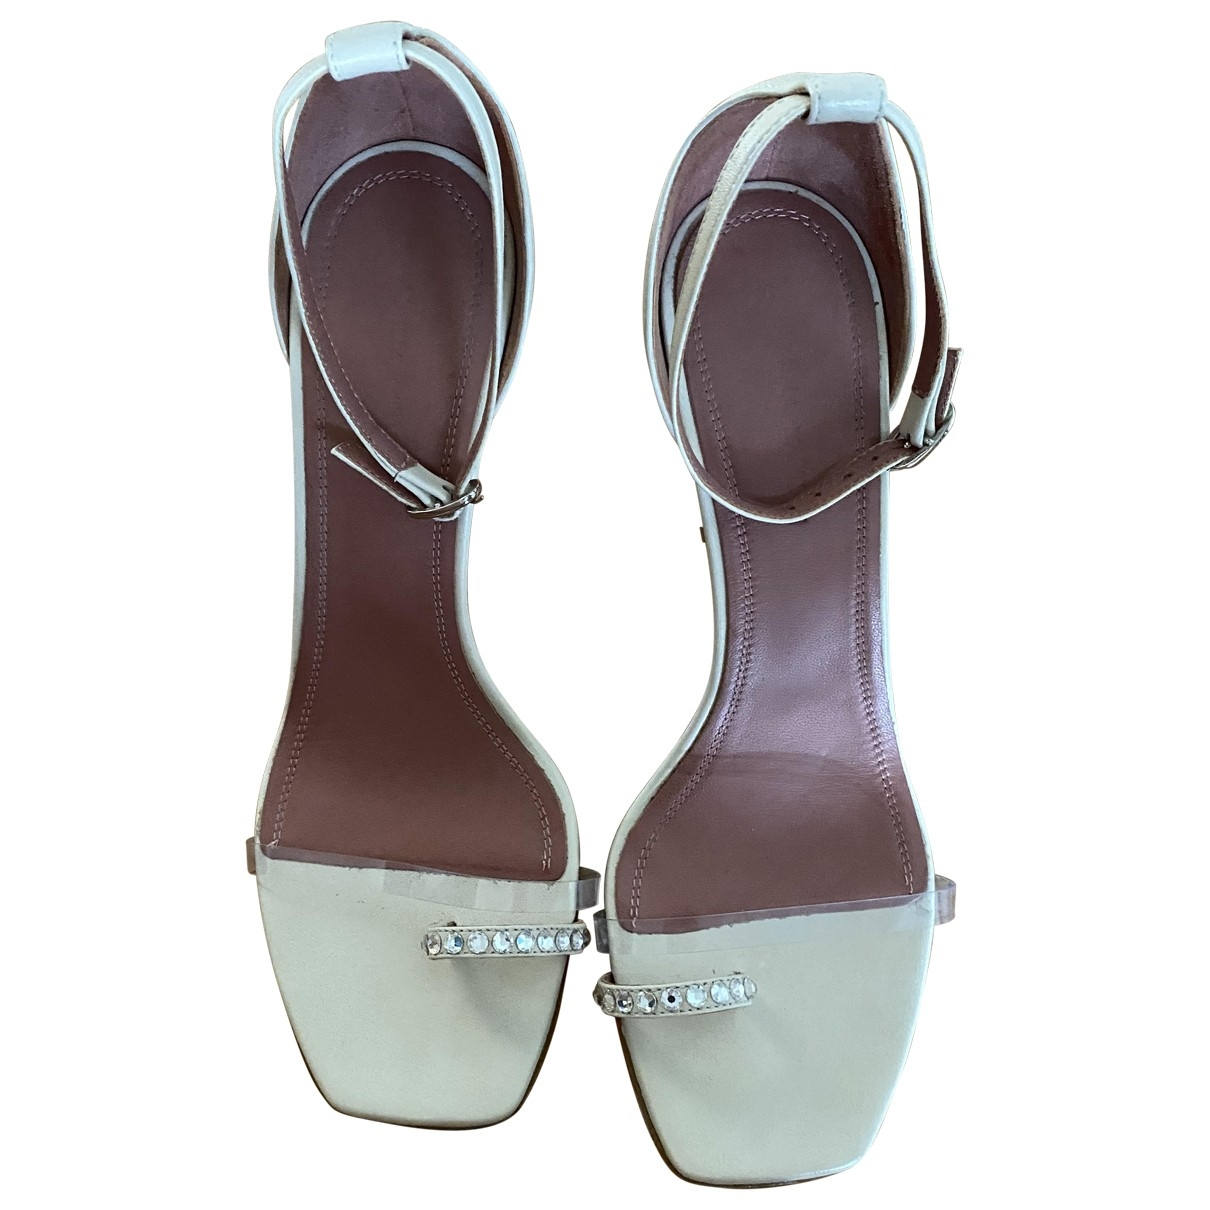 Amina Muaddi - Sandales   pour femme en cuir - blanc